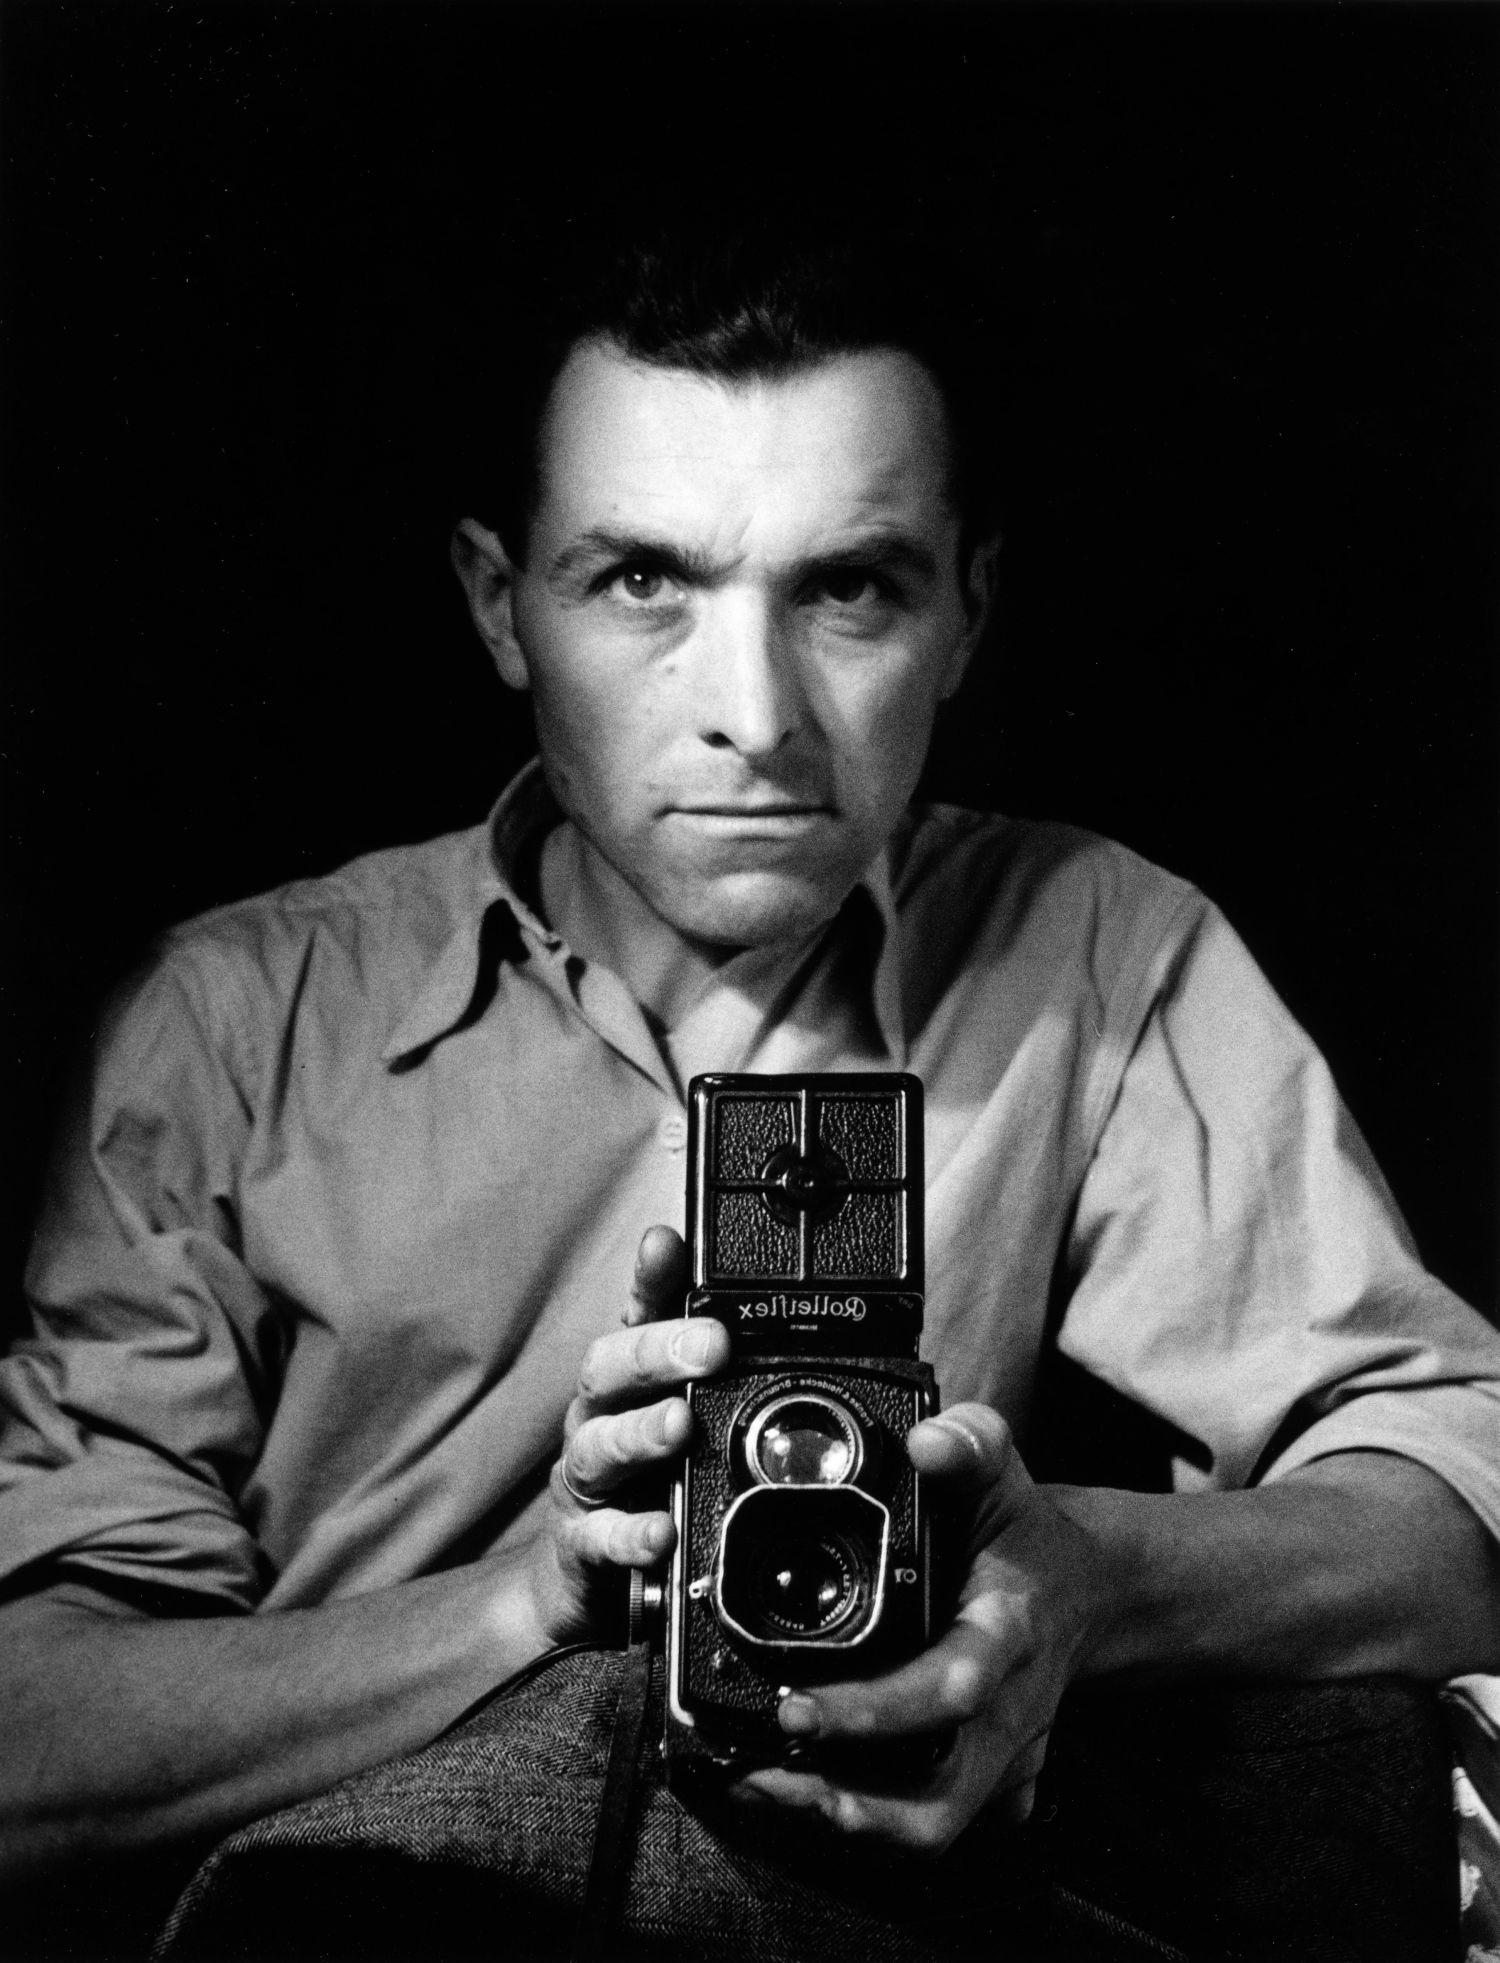 robert-doisneau-autoportrait-au-rolleiflex-1947-©-atelier-robert-doisneau